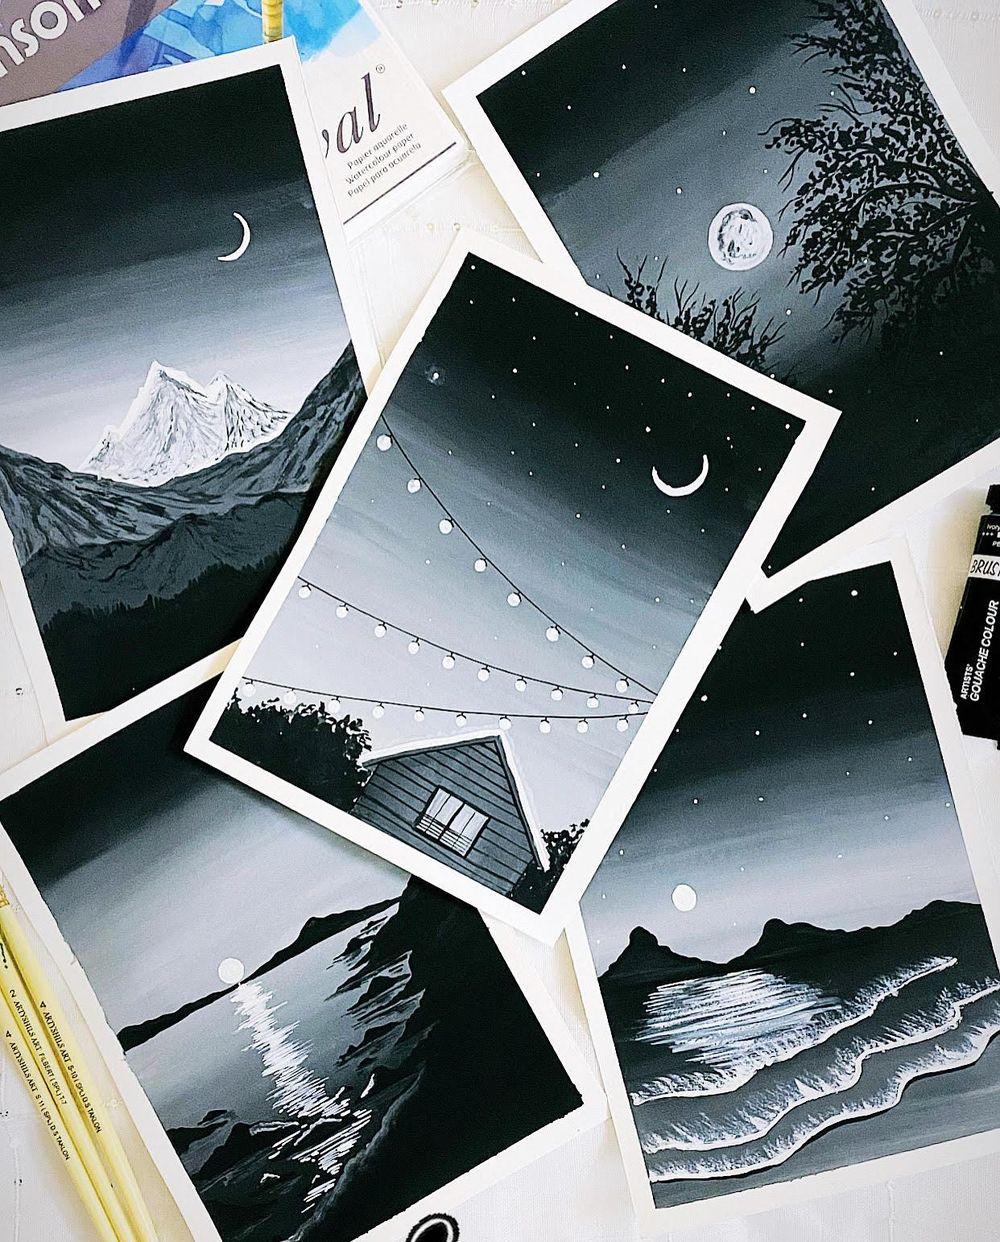 Monochrome - image 1 - student project